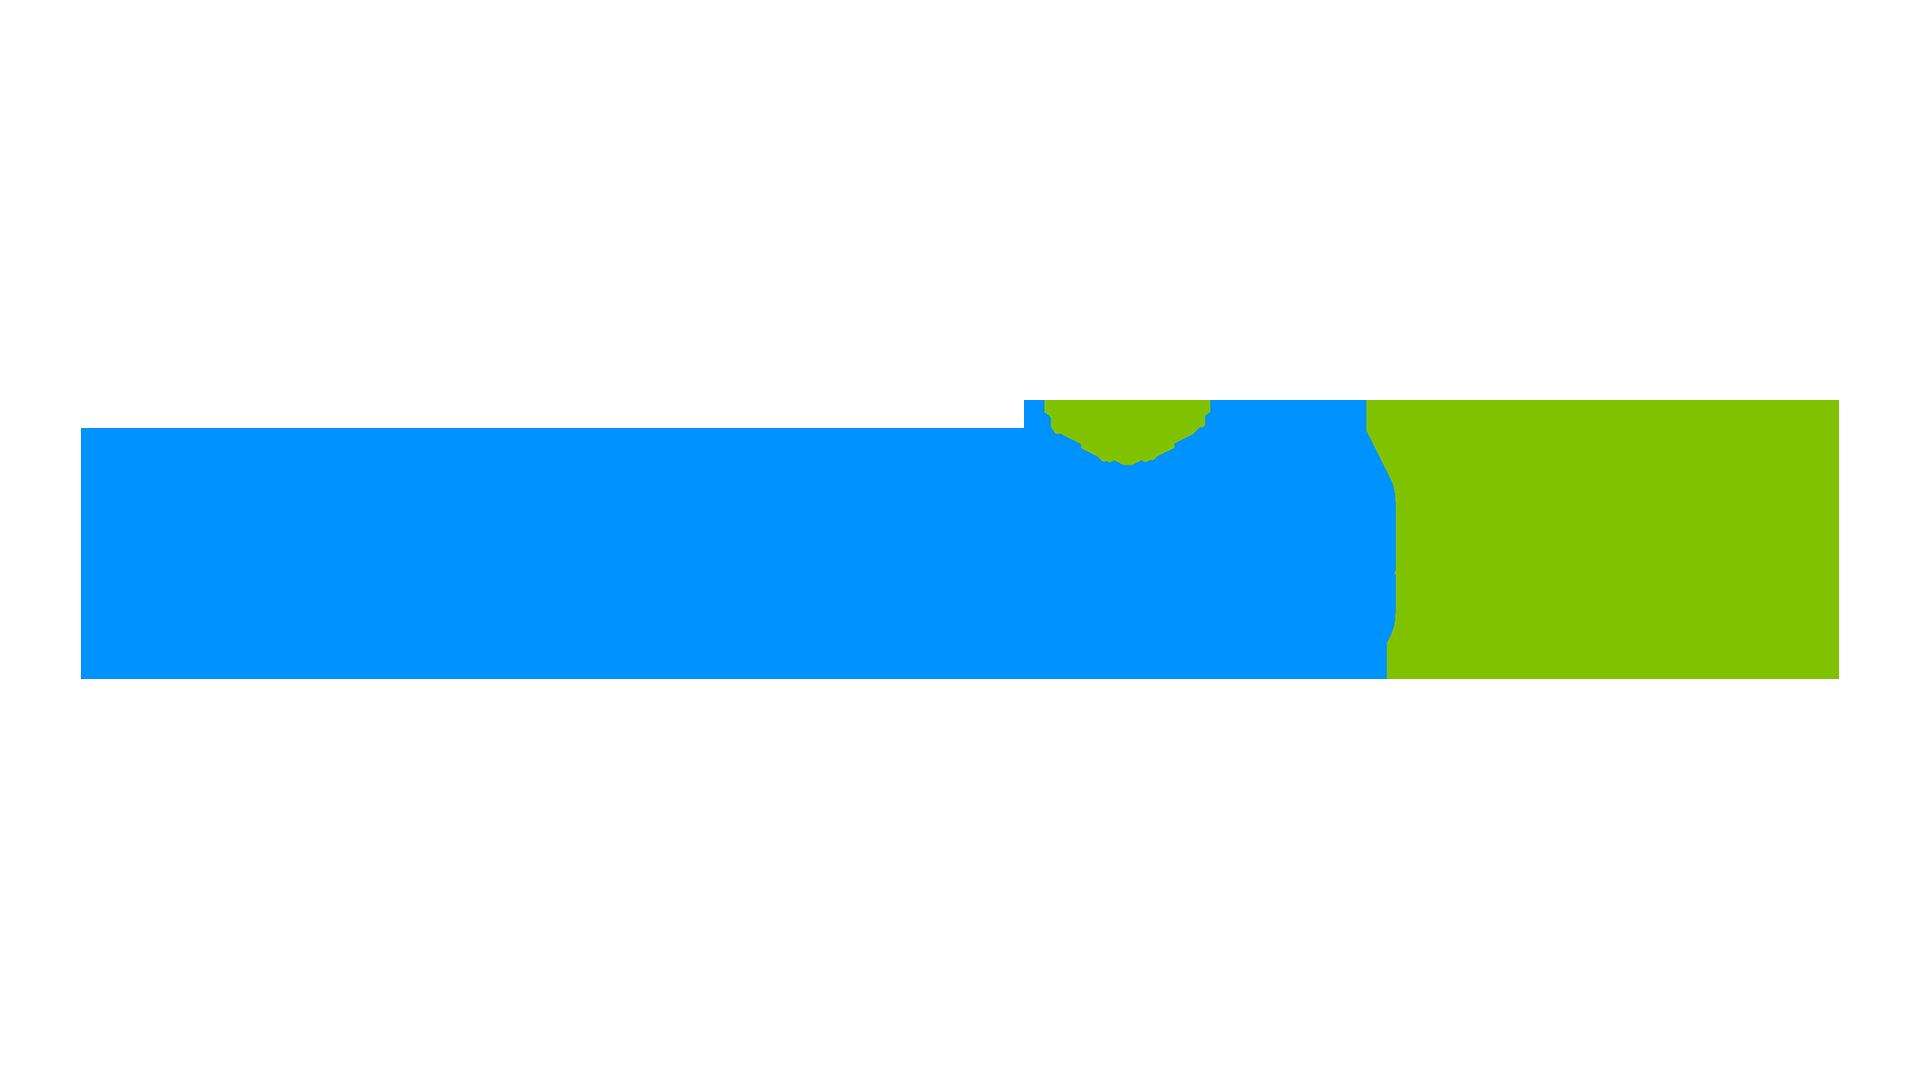 Search Engine Land – Recordsdata On Search Engines, Search Engine Optimization (SEO) & Search Engine Marketing (SEM)